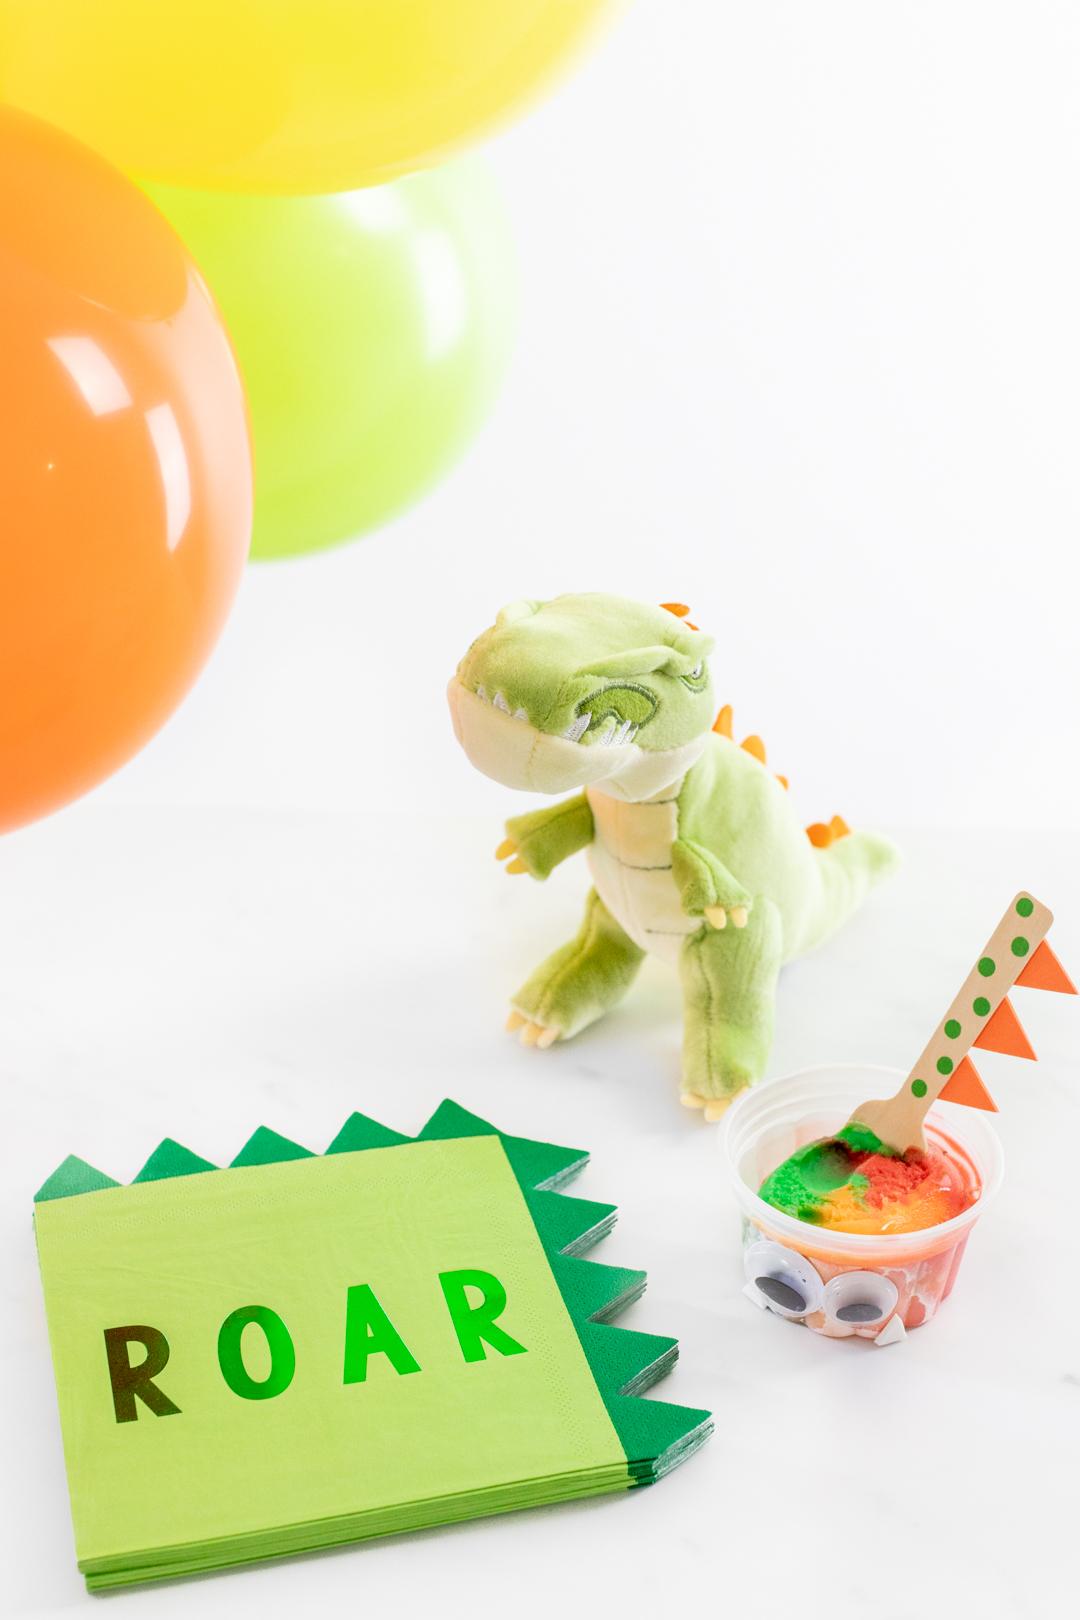 Adorable Dinosaur themed napkins that say Roar.